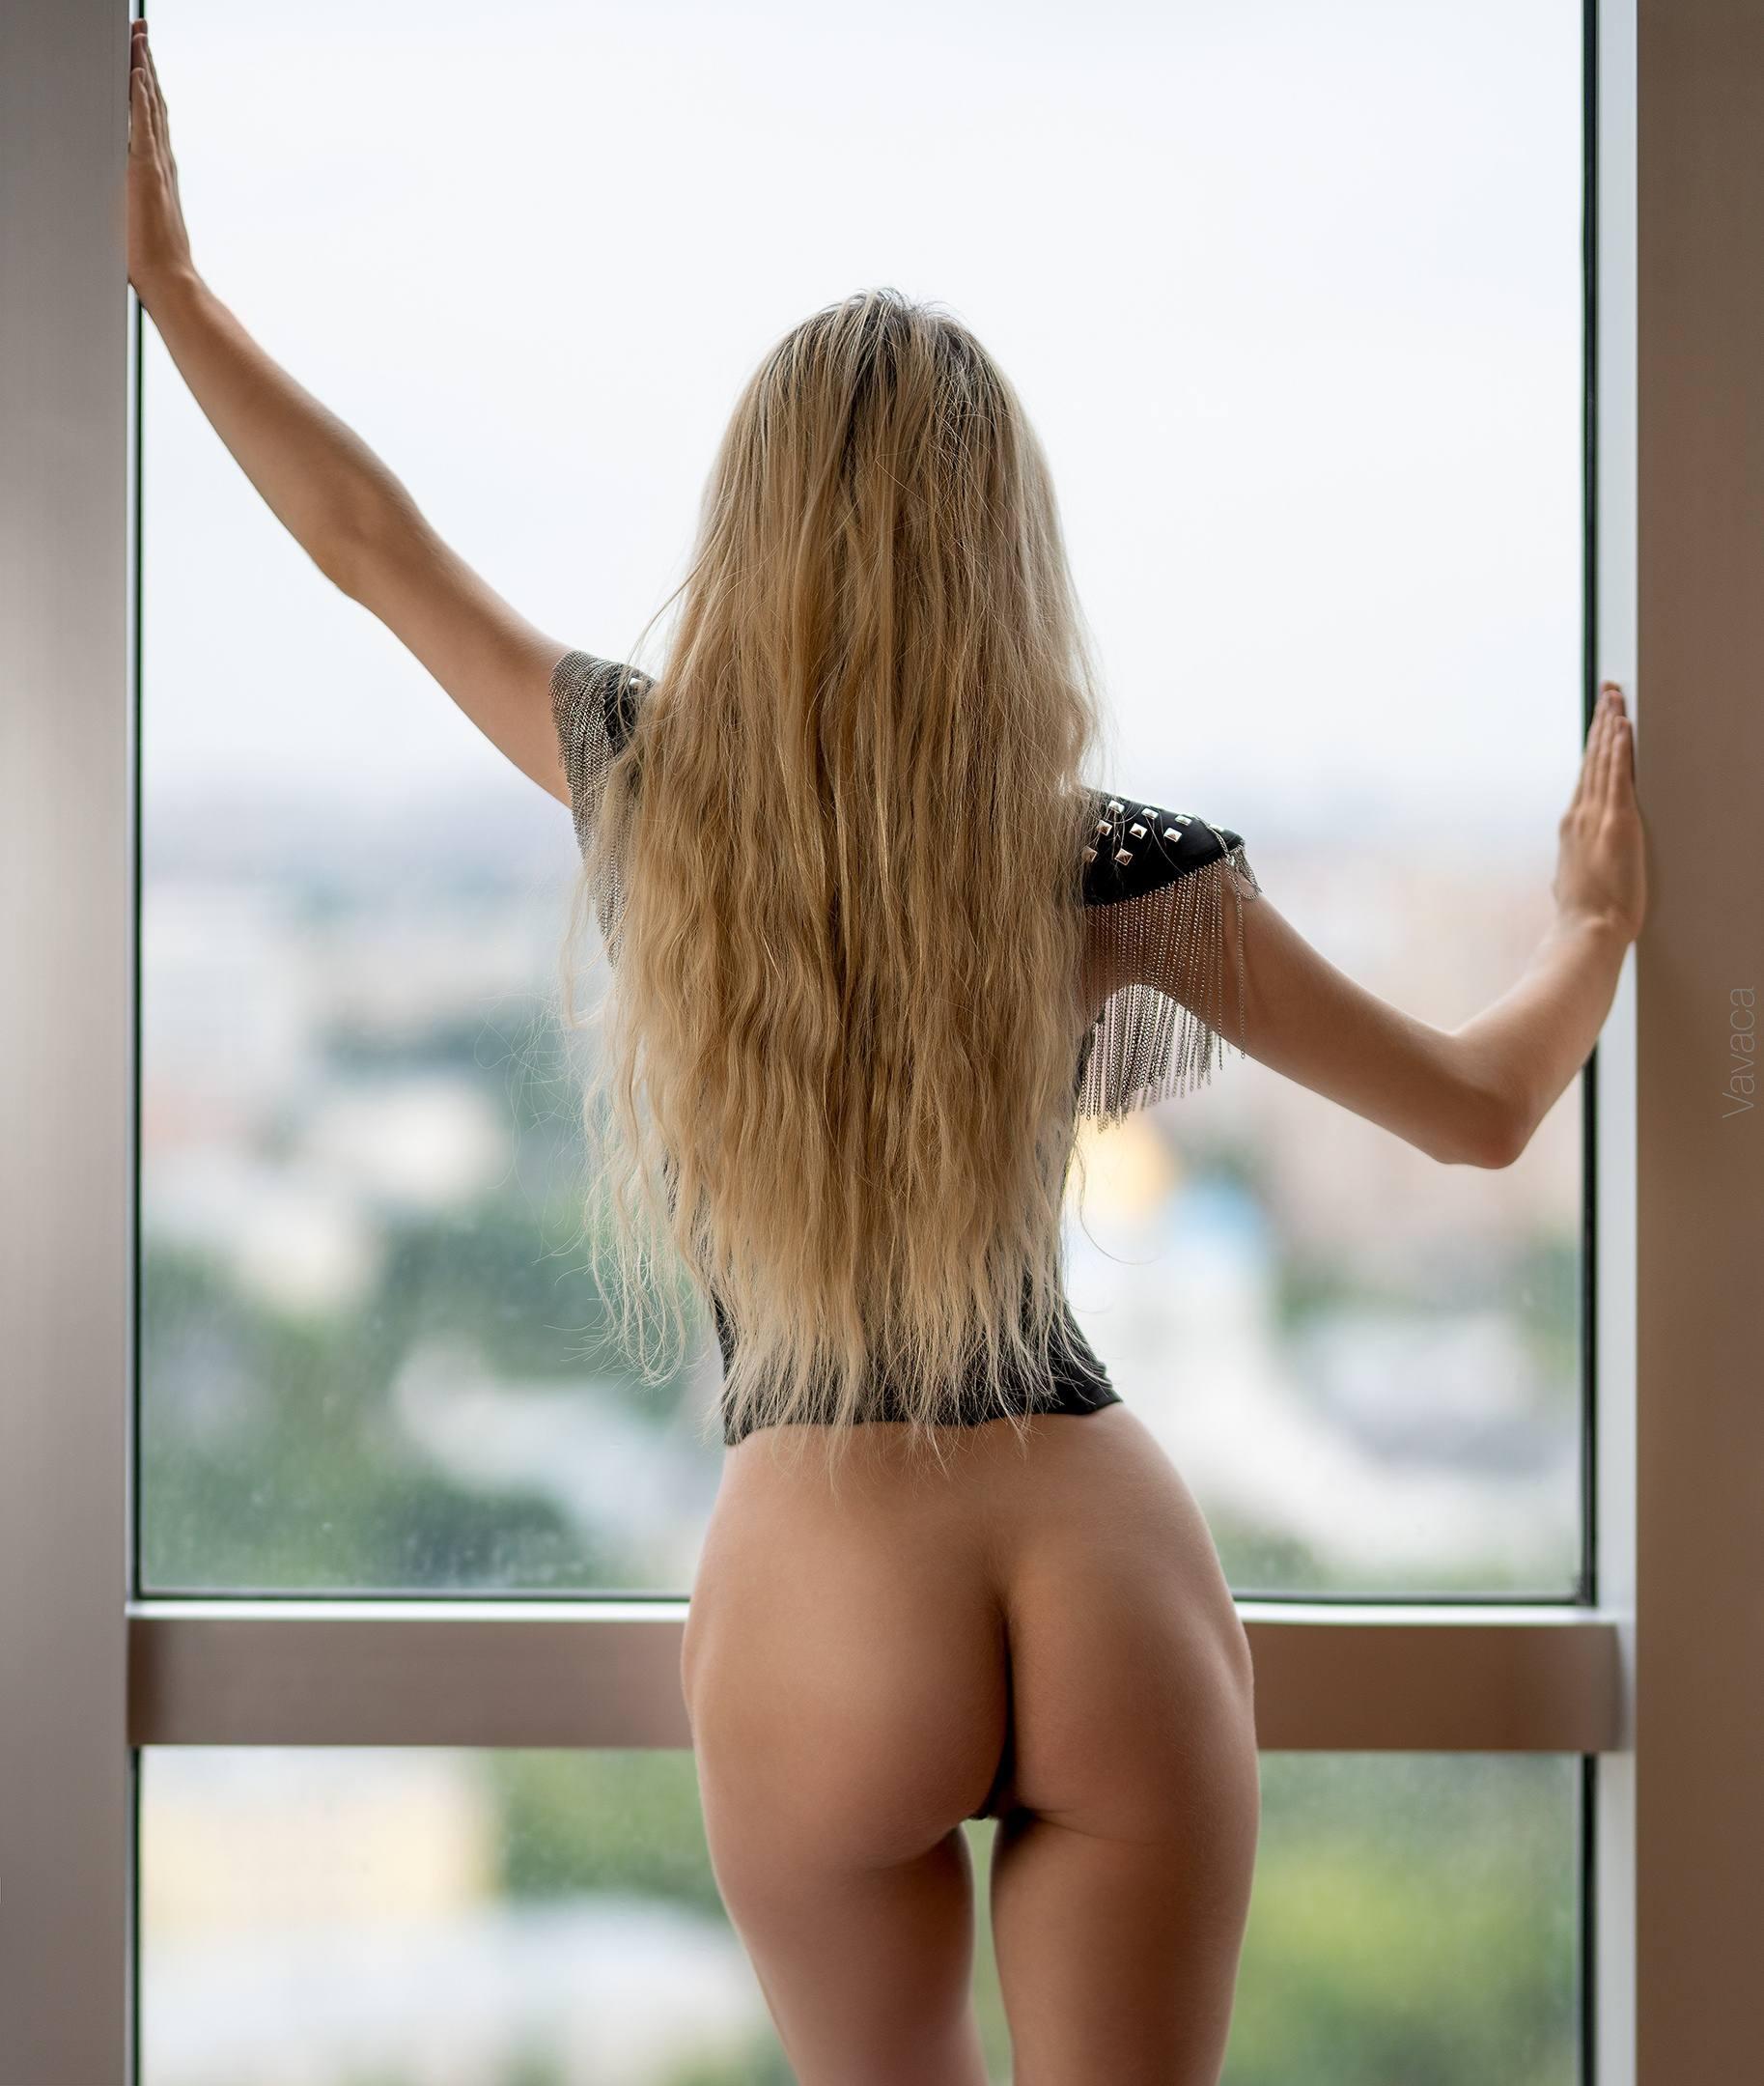 Aleksandra Smelova Full Frontal Nudity